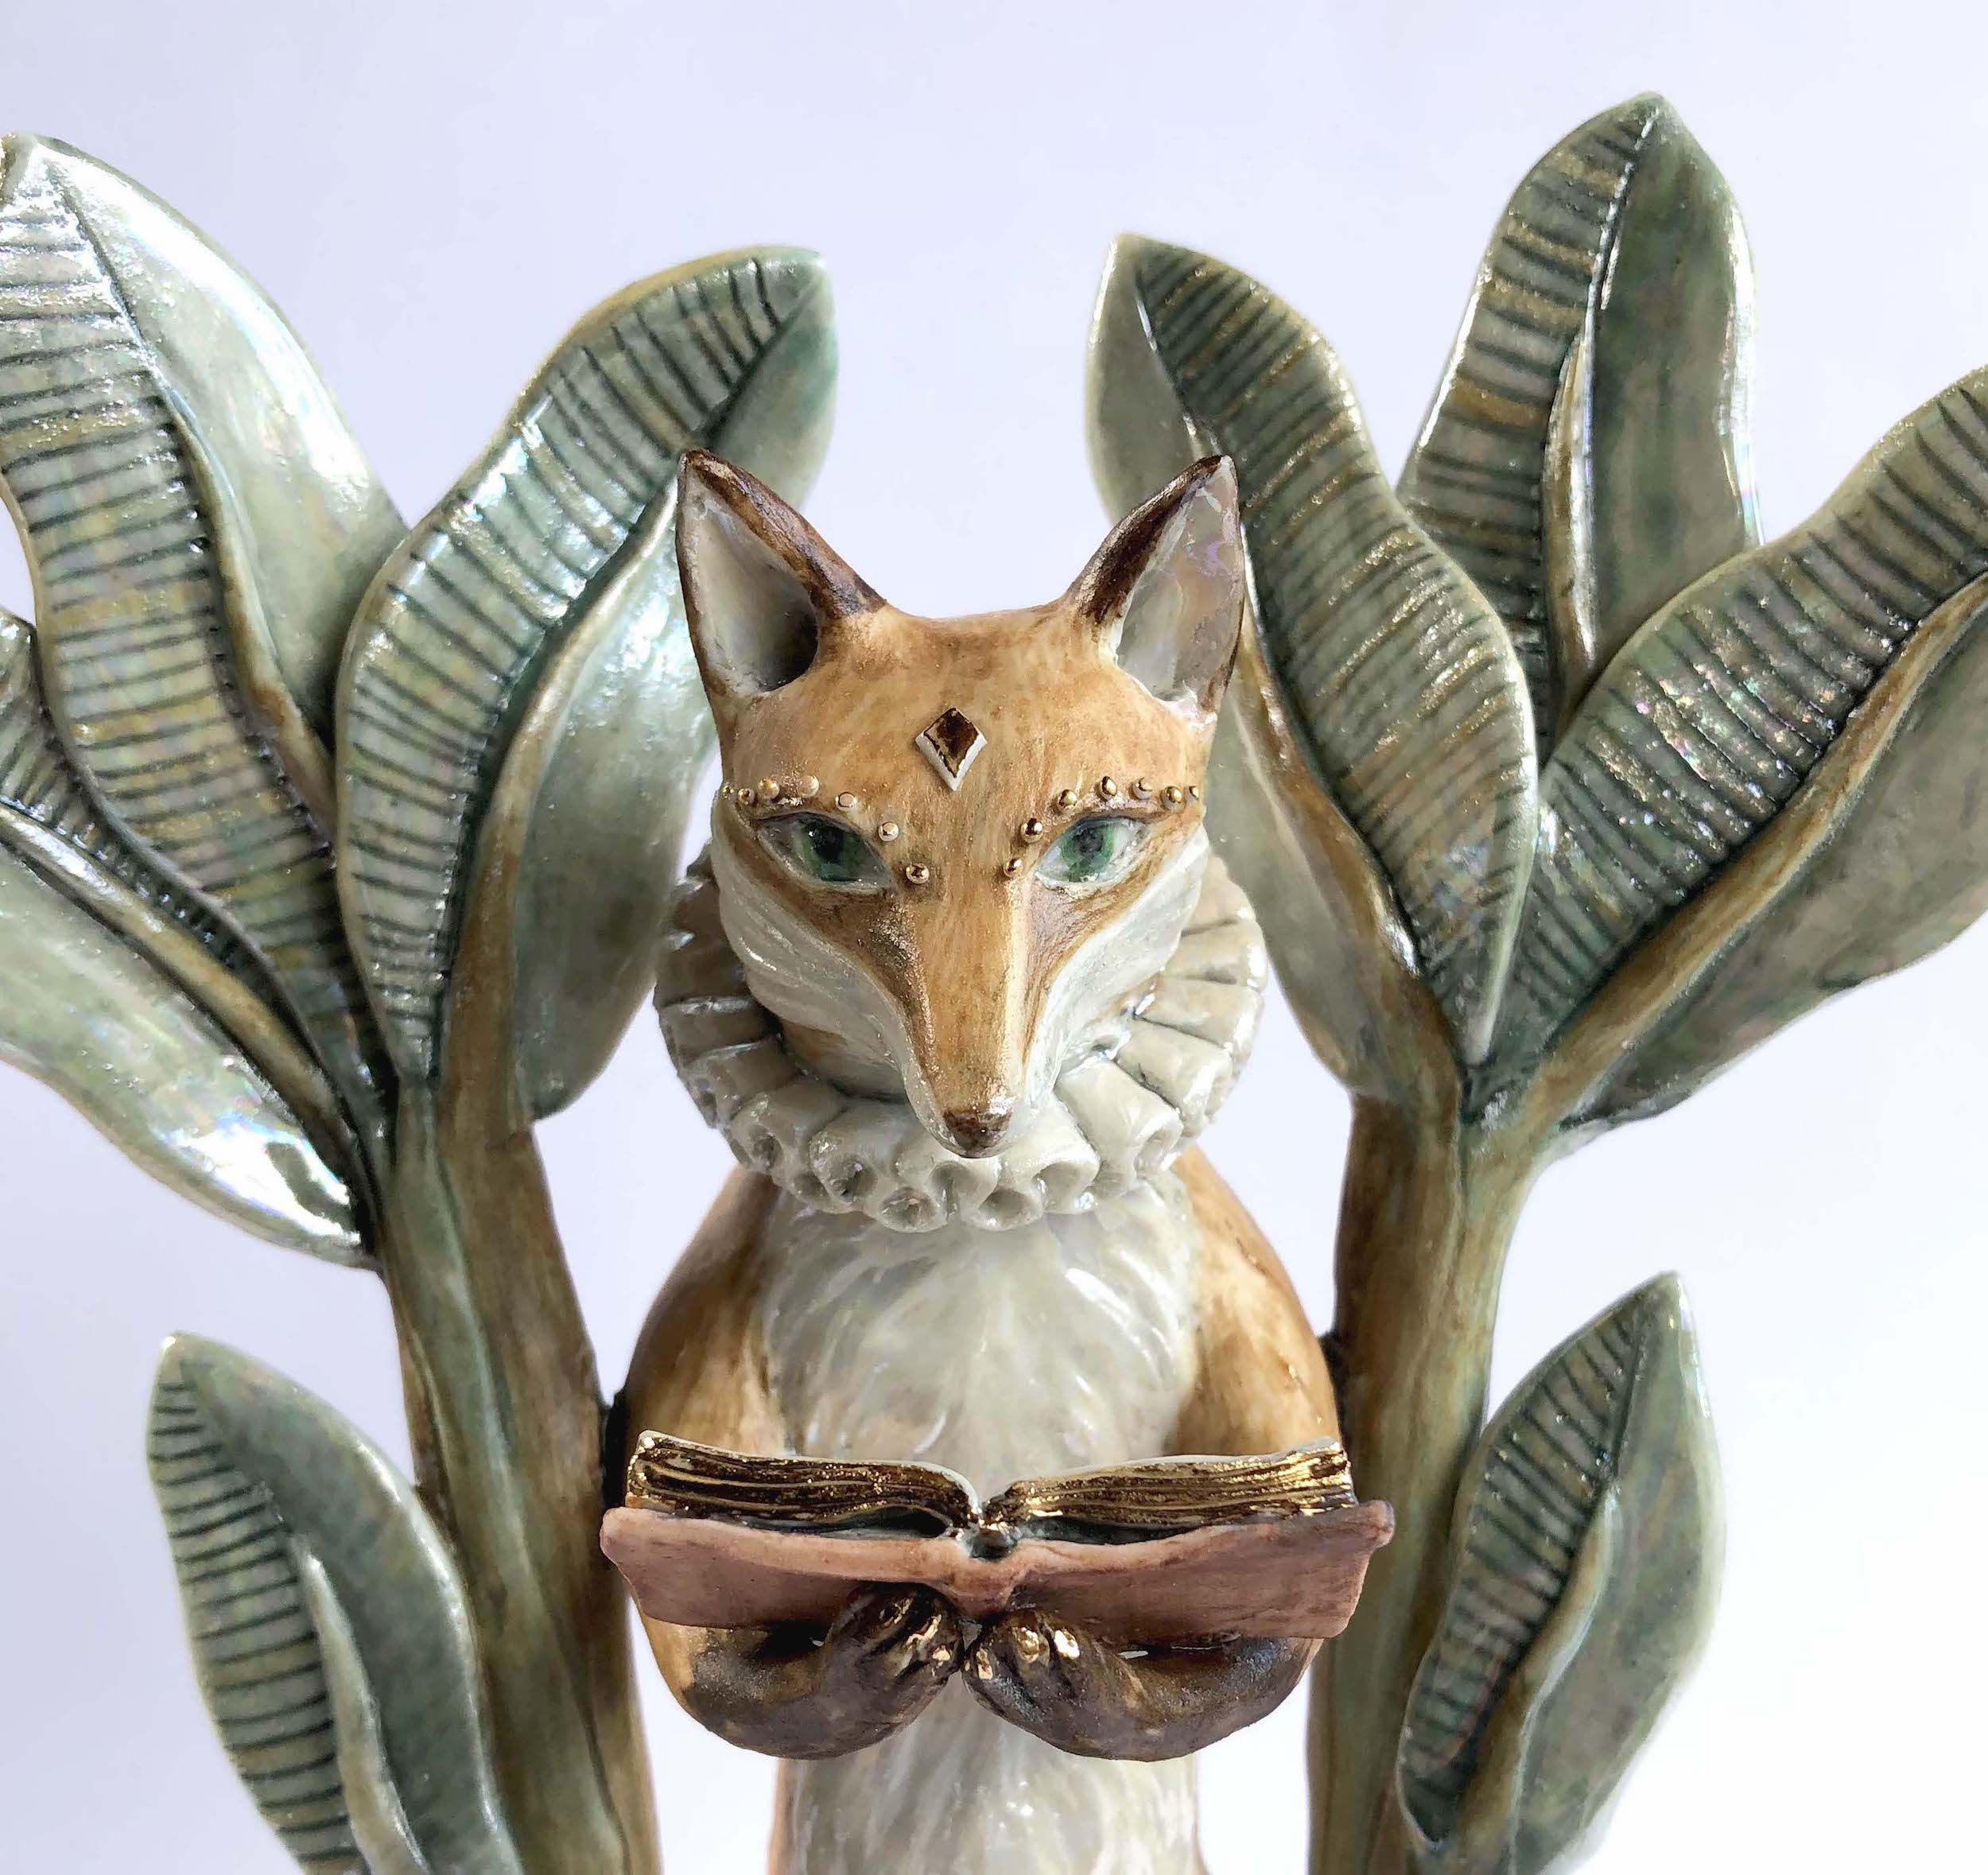 'The Guide' Ceramic Sculpture